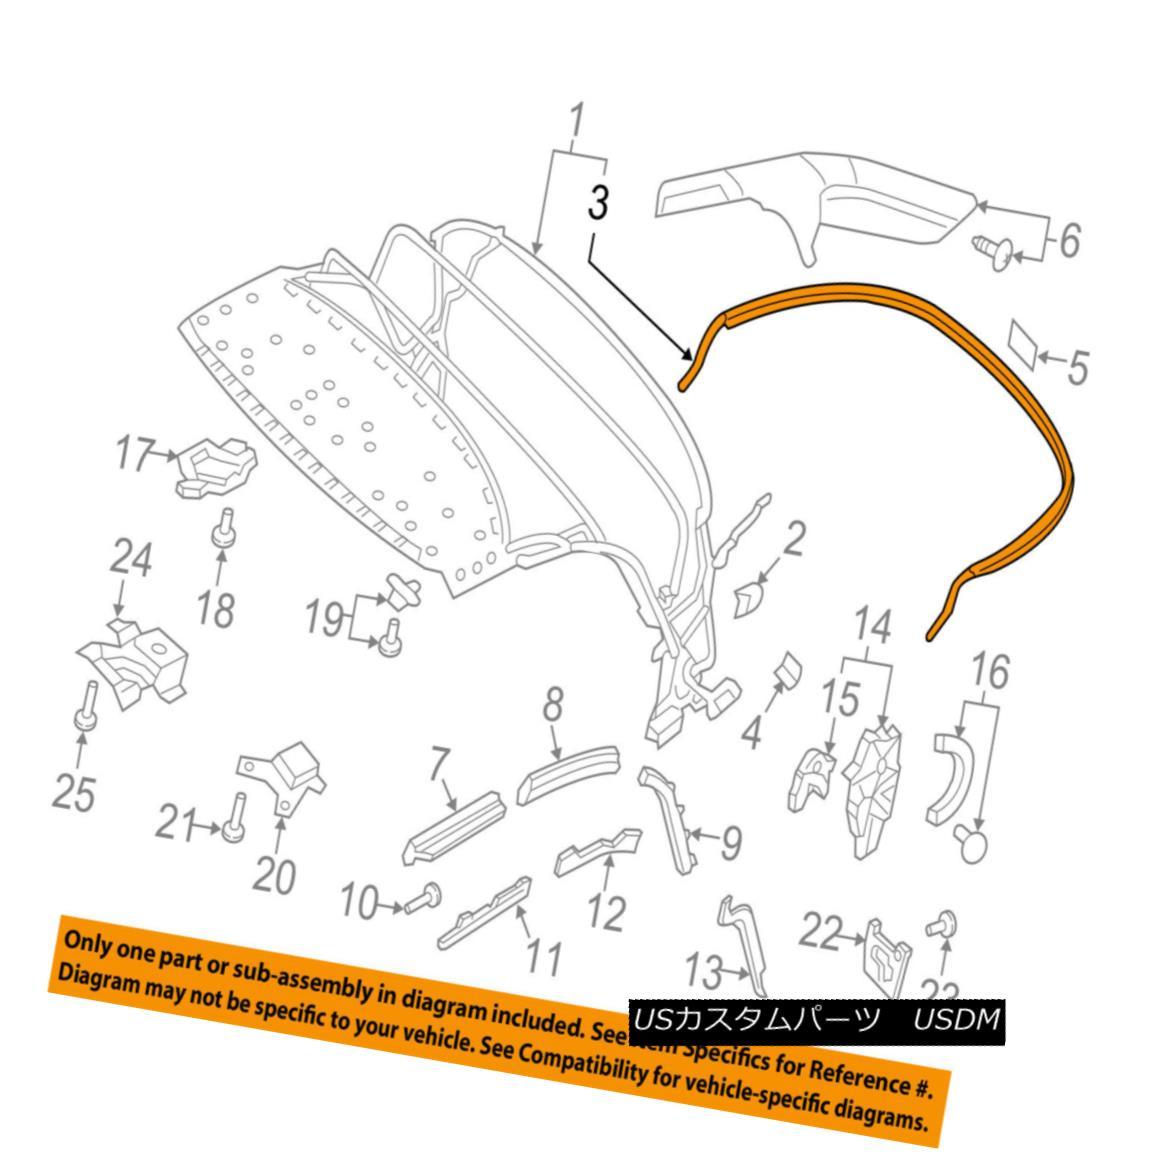 <title>車用品 バイク用品 >> パーツ 外装 エアロパーツ その他 幌 ソフトトップ AUDI OEM 《週末限定タイムセール》 16-17 TT Quattro Convertible soft Top-Rear Bow 8S7871553 so ftトップリアボウ8S7871553</title>